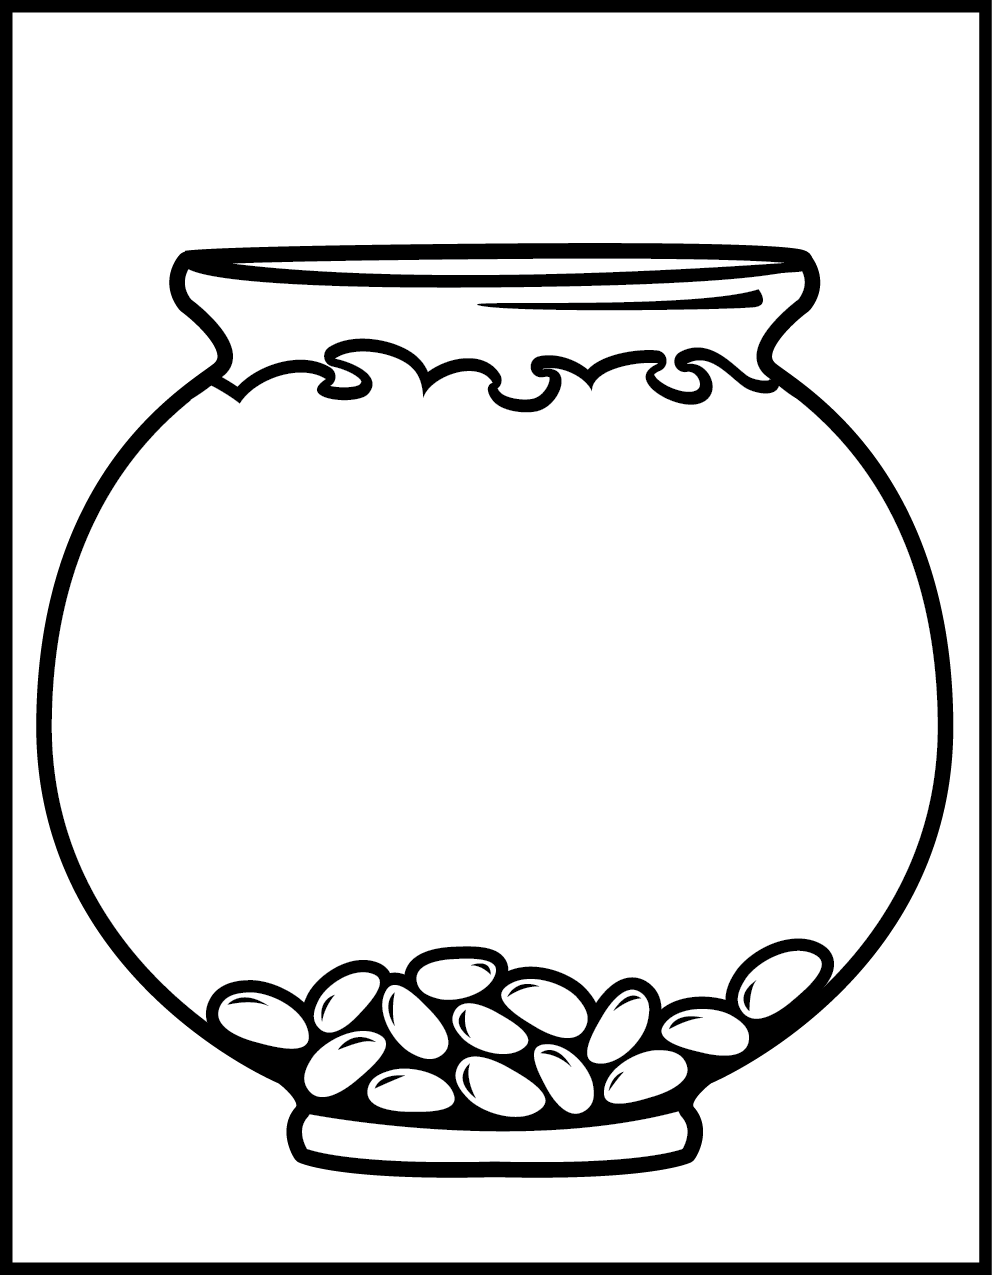 992x1275 Fish Clip Art Black And White Fish Bowl Clip Art Black White